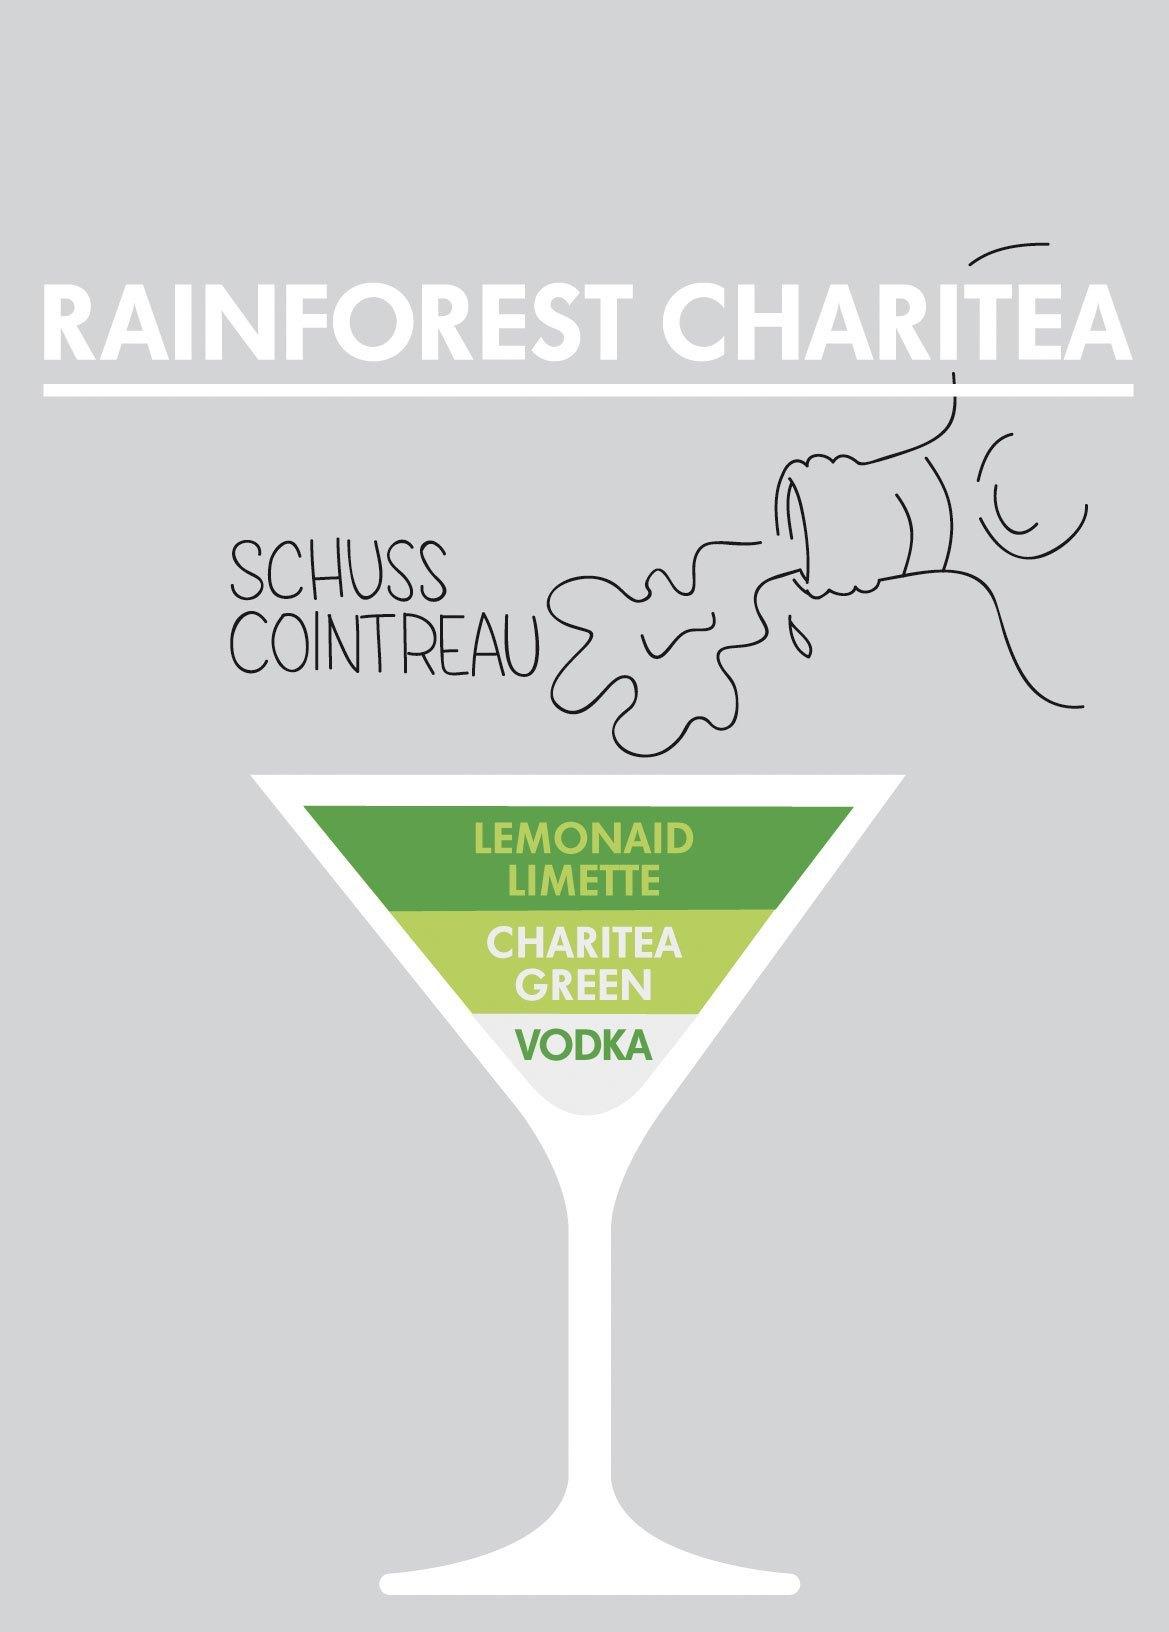 Bild_Cocktail_Illus_Rainforest_ChariTea_Teaser